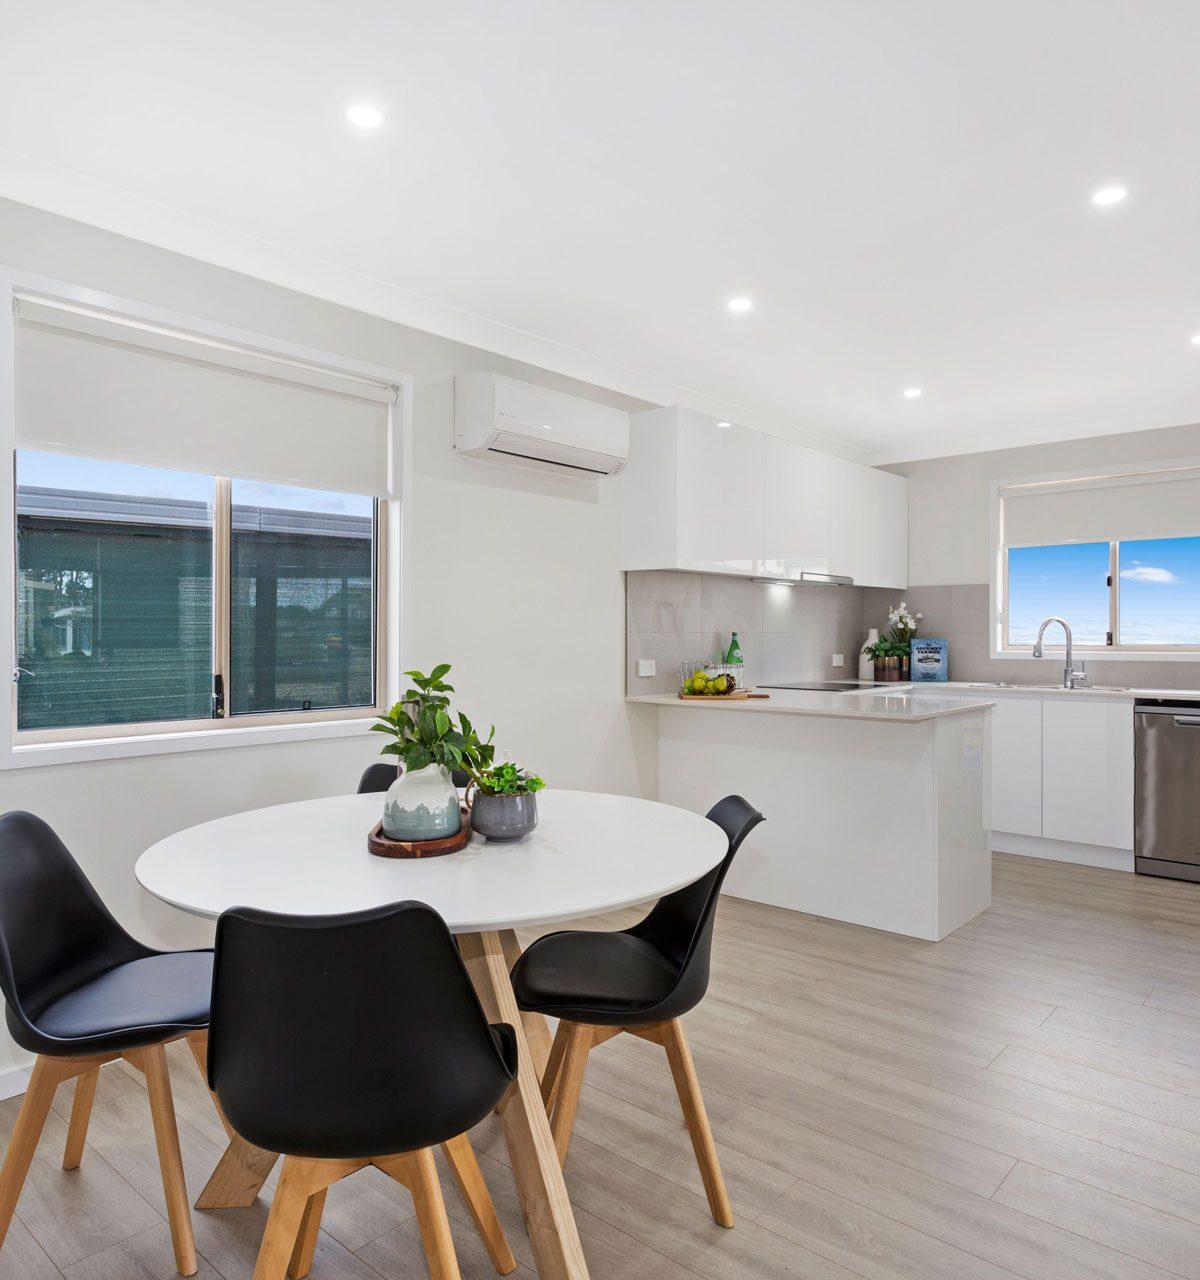 Bringing creative home renovation ideas to life